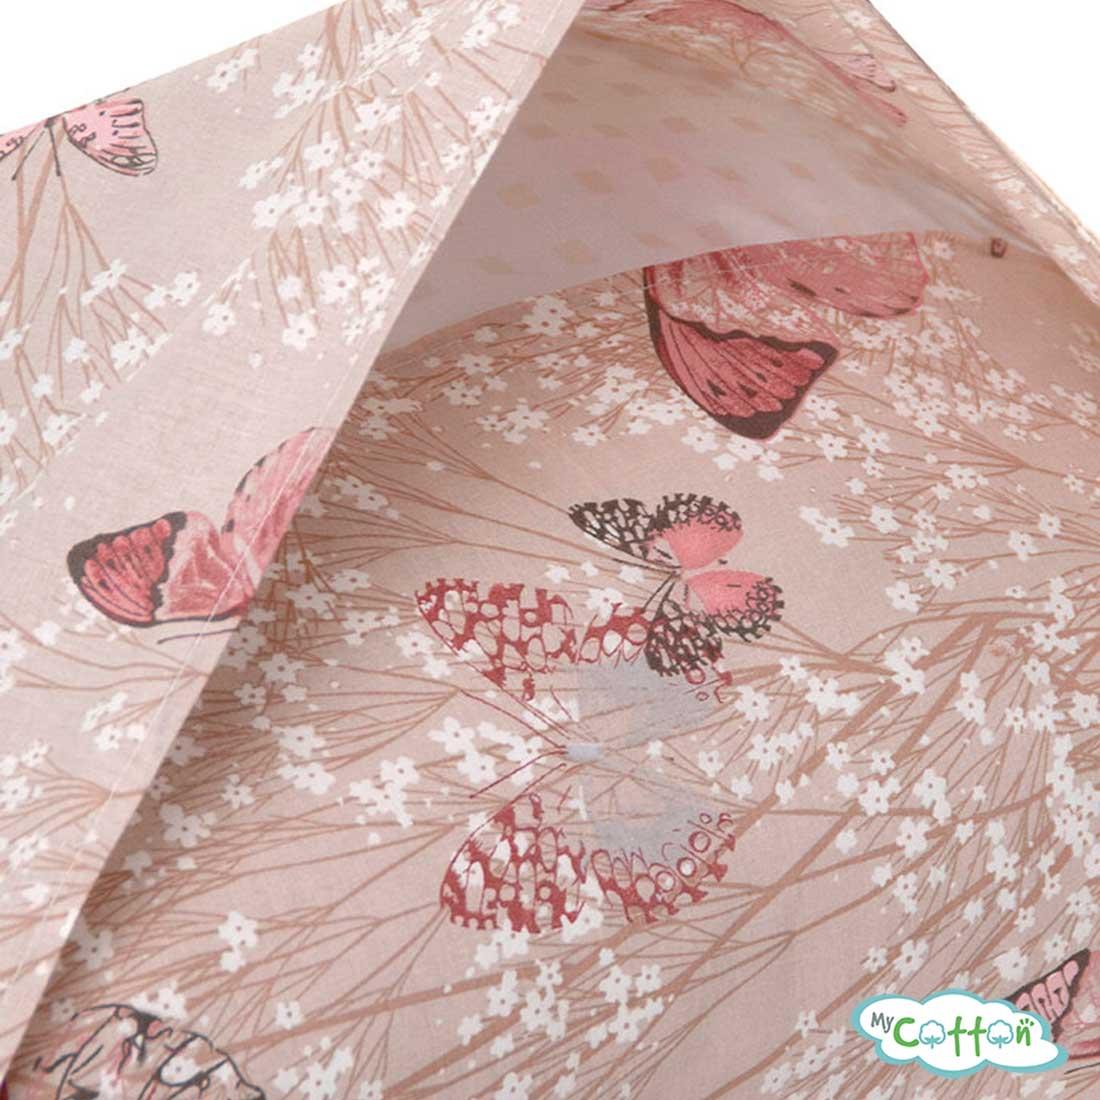 Постельное белье Butterflyколлекция Marilyn Monroe5